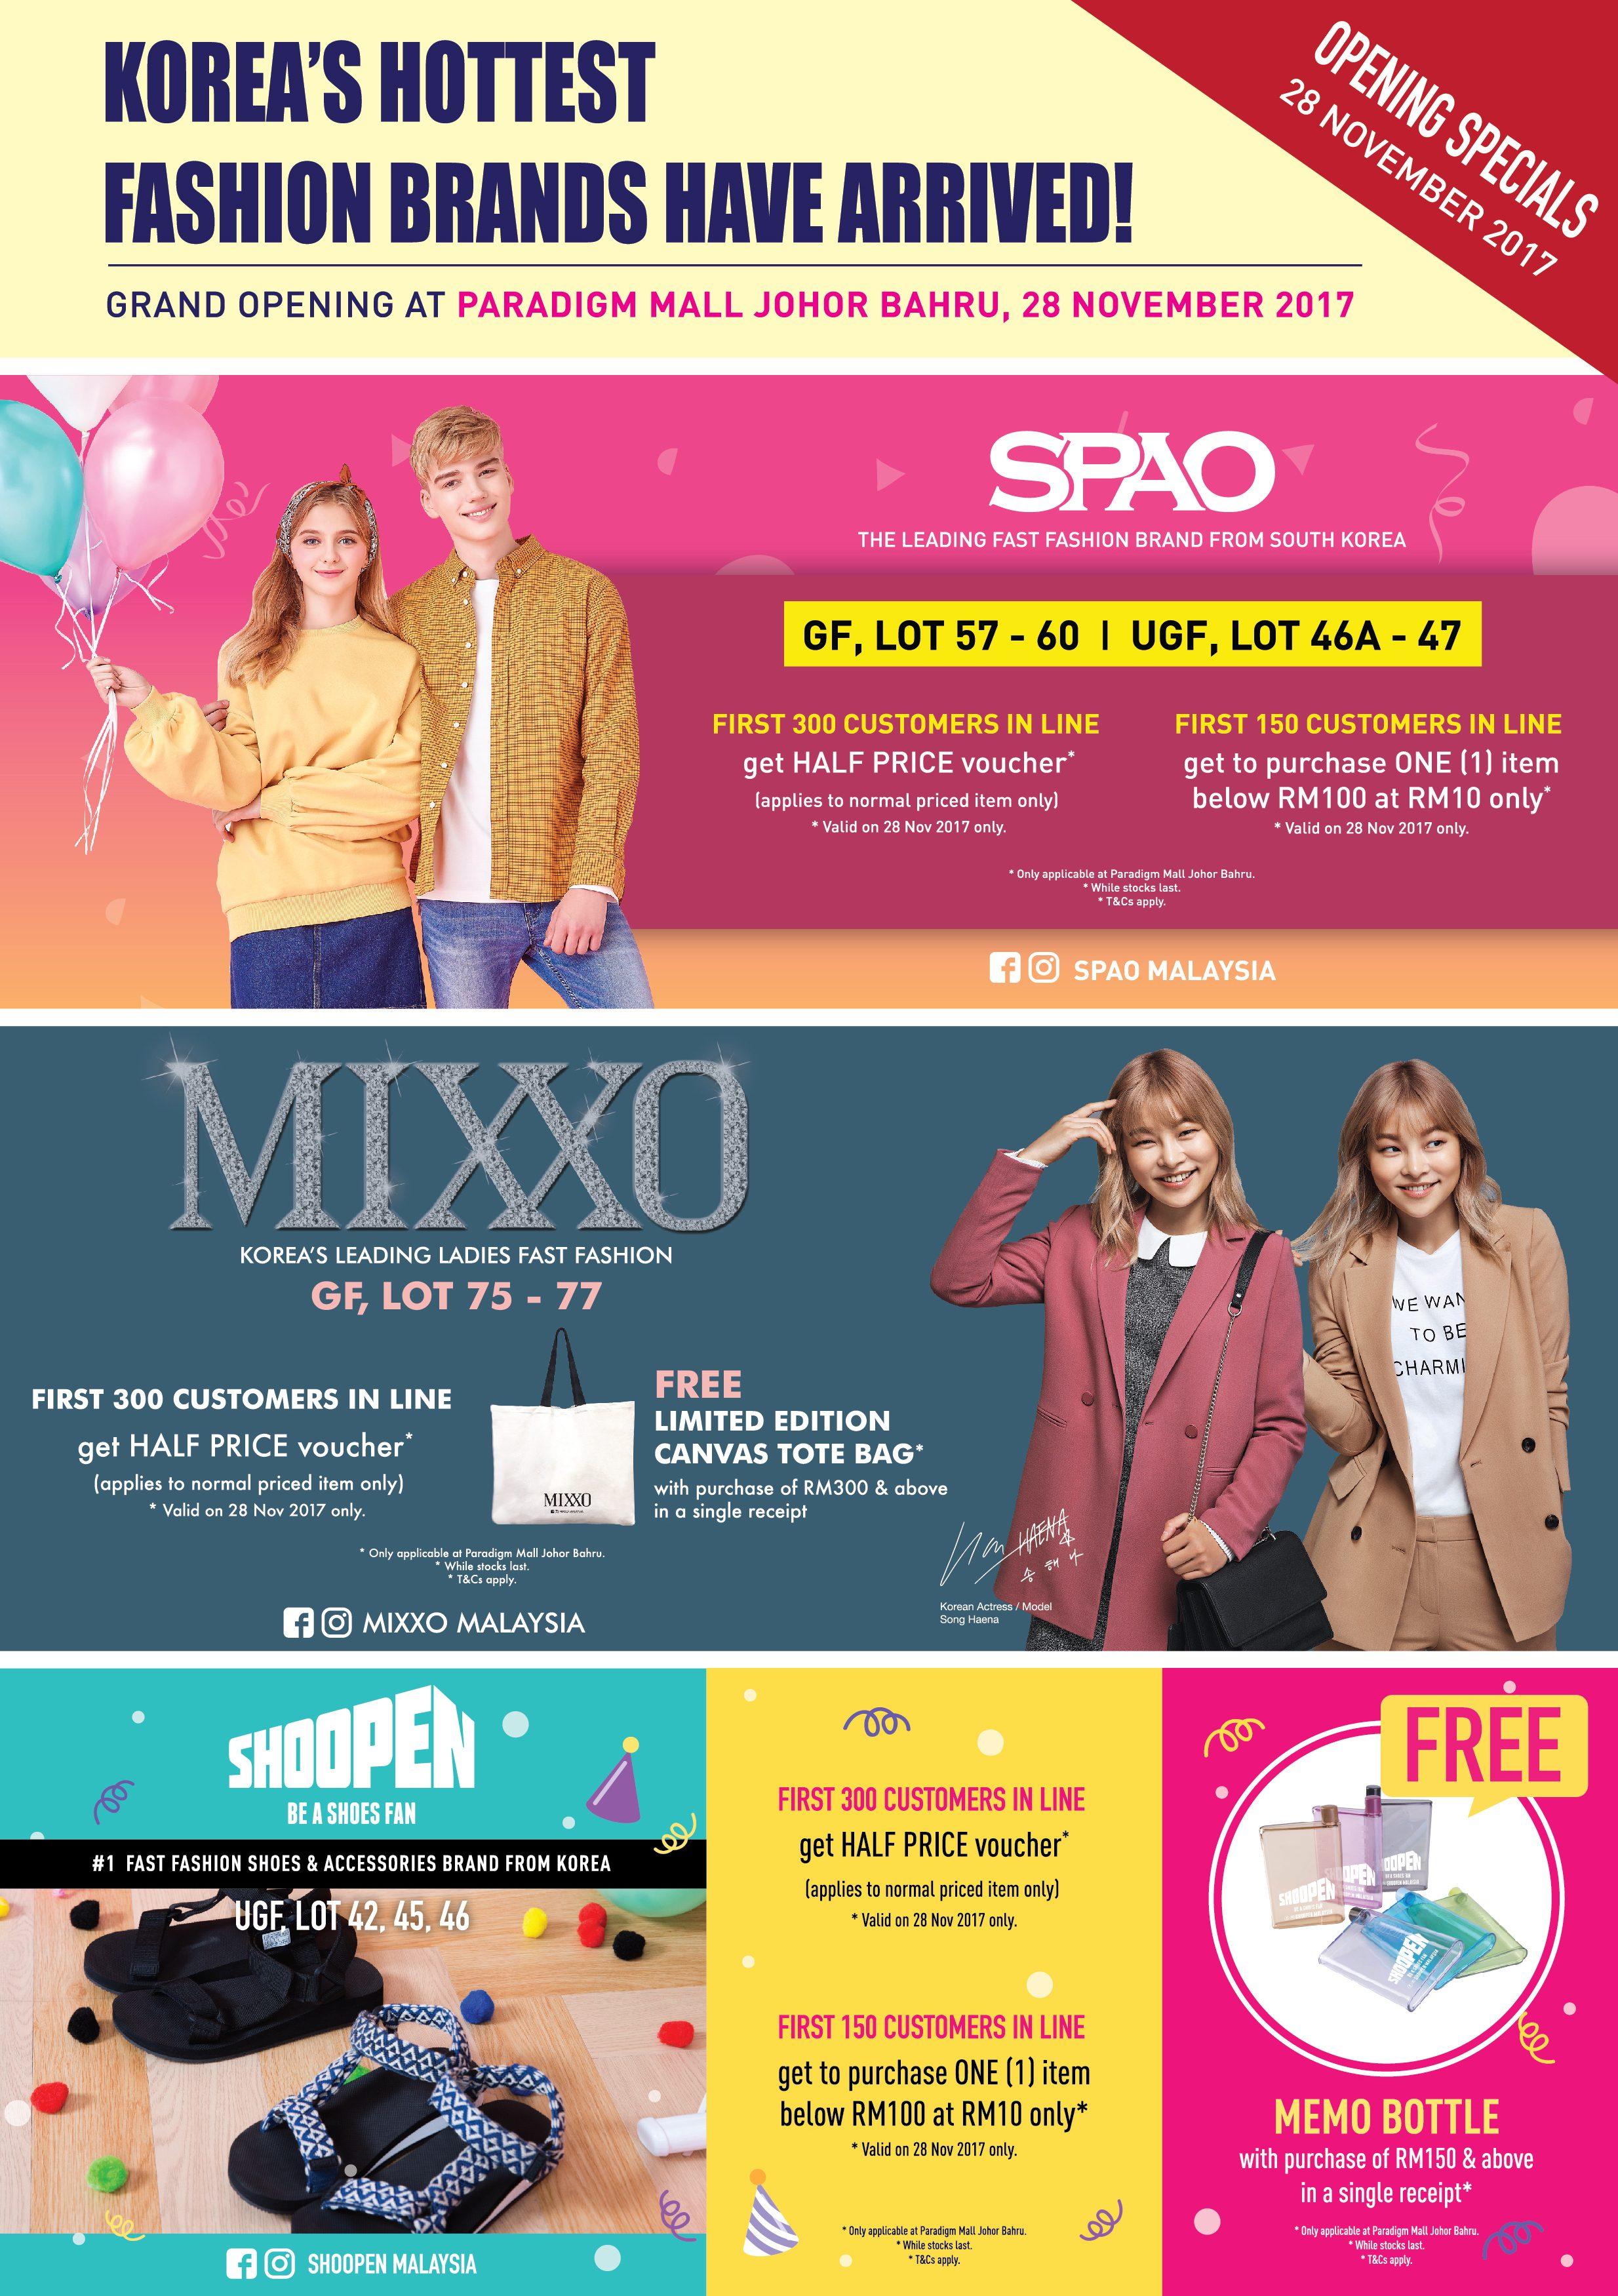 Top Korean Fashion Brands Hitting Up Paradigm Mall in Johor